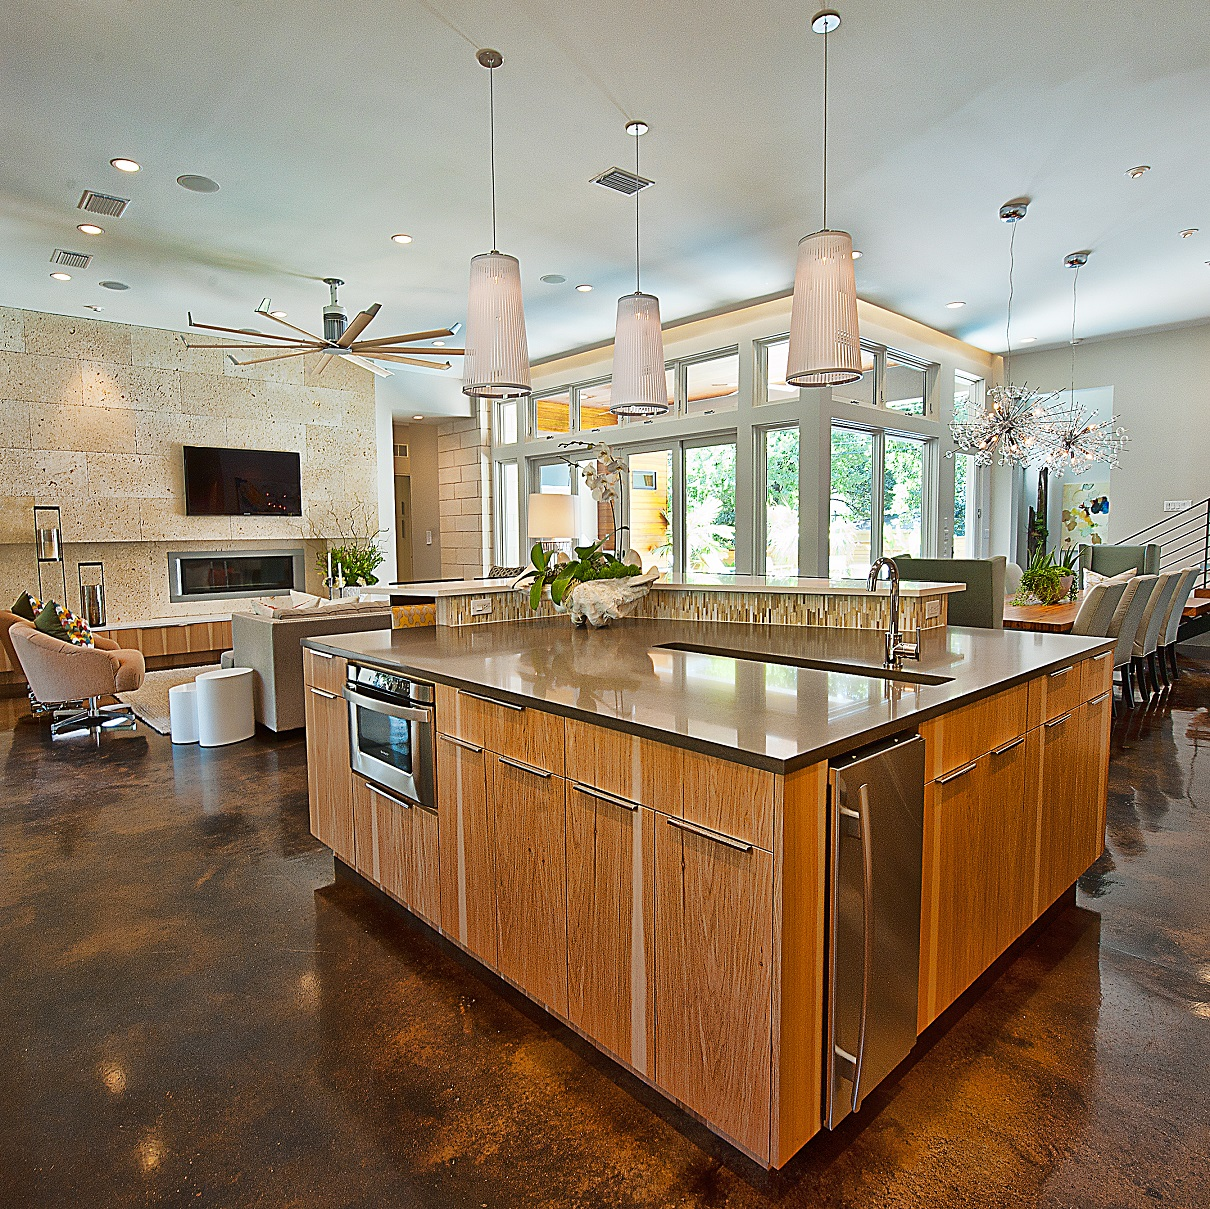 bowman-kitchen-island